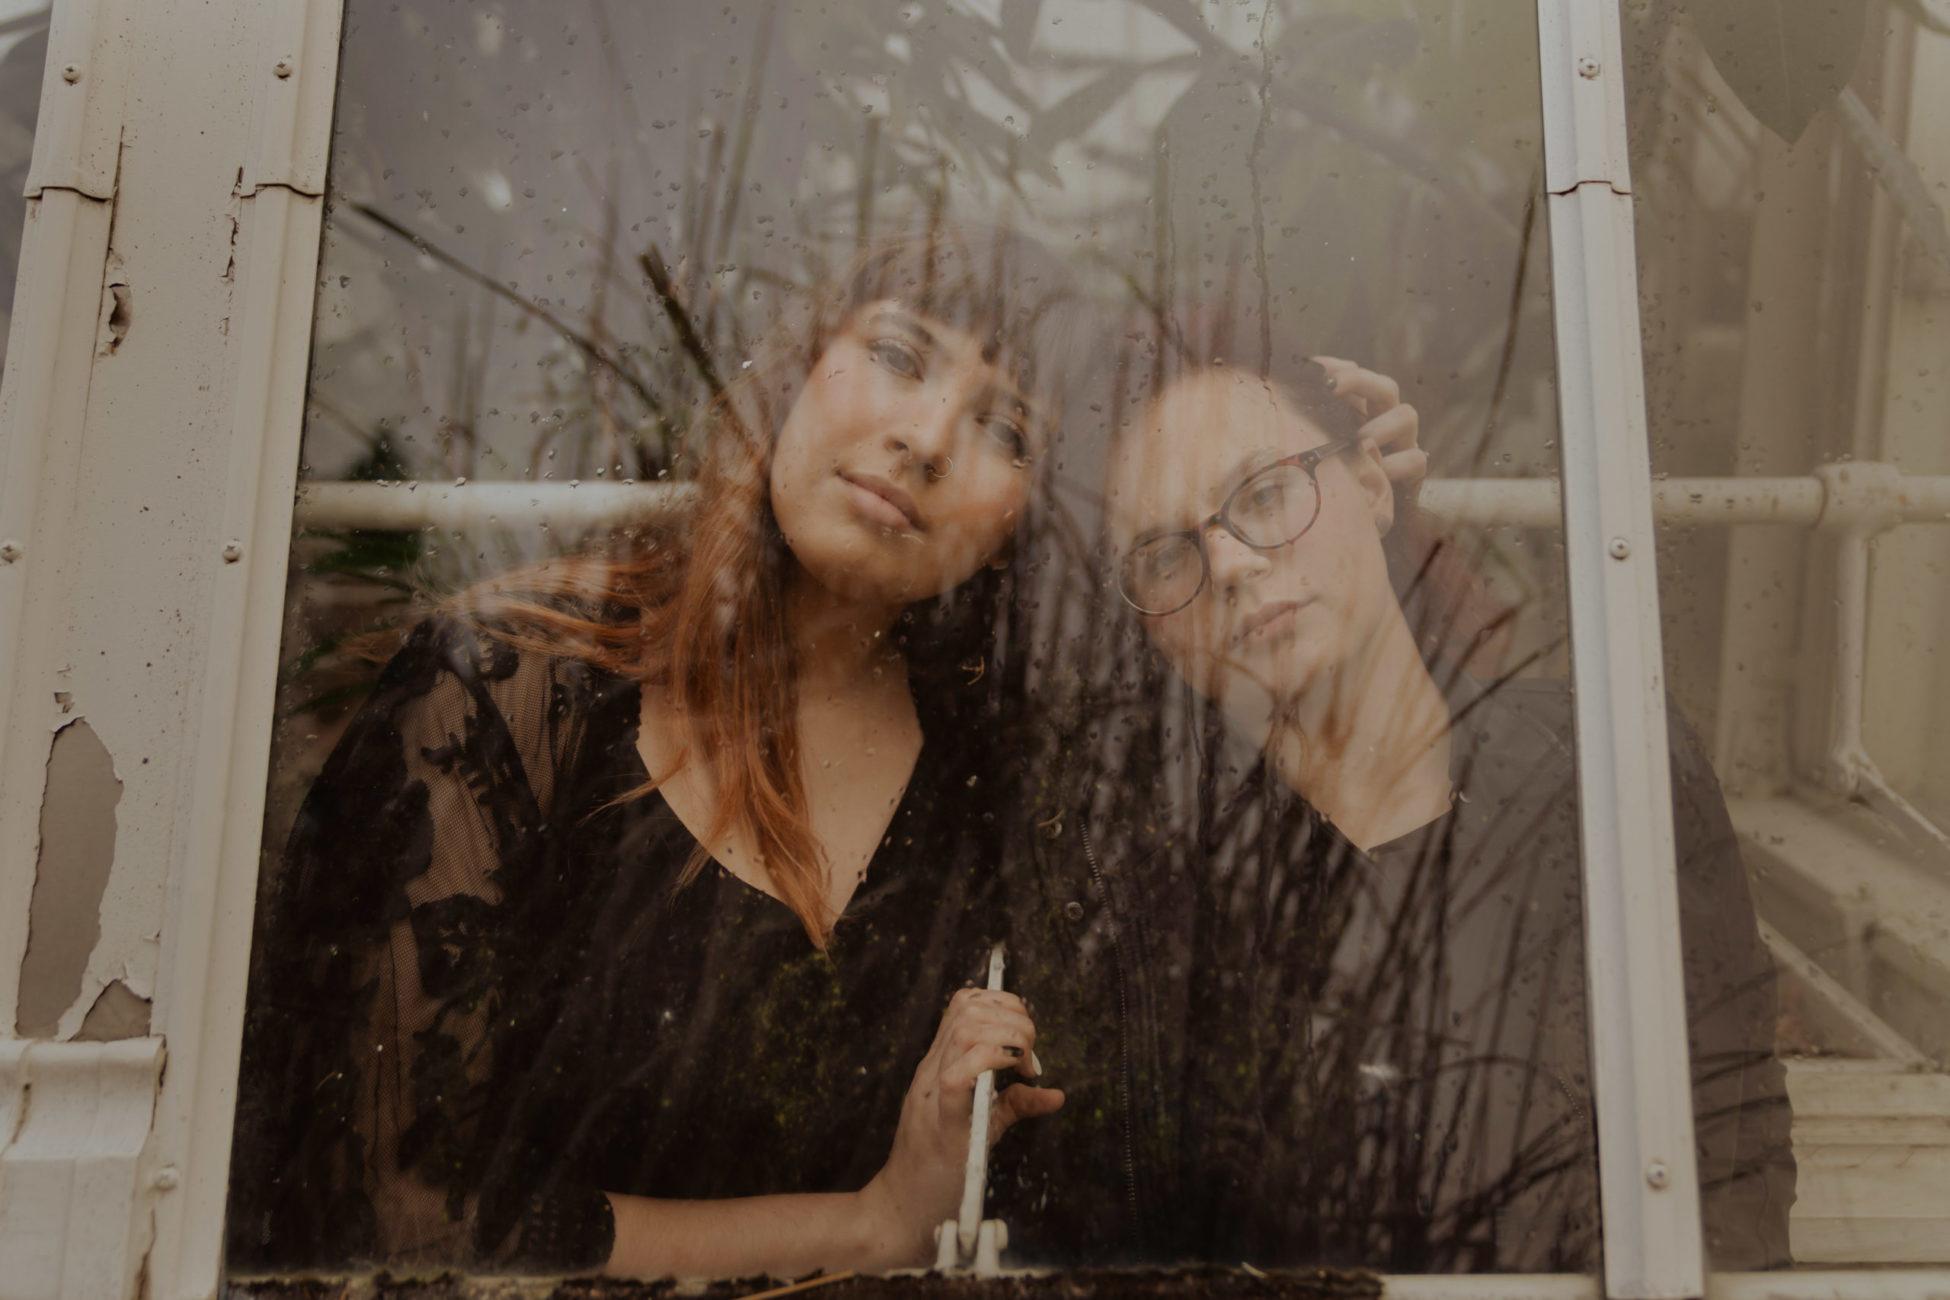 lgbtq-couple-window-rain-photo-tulsa-photographer